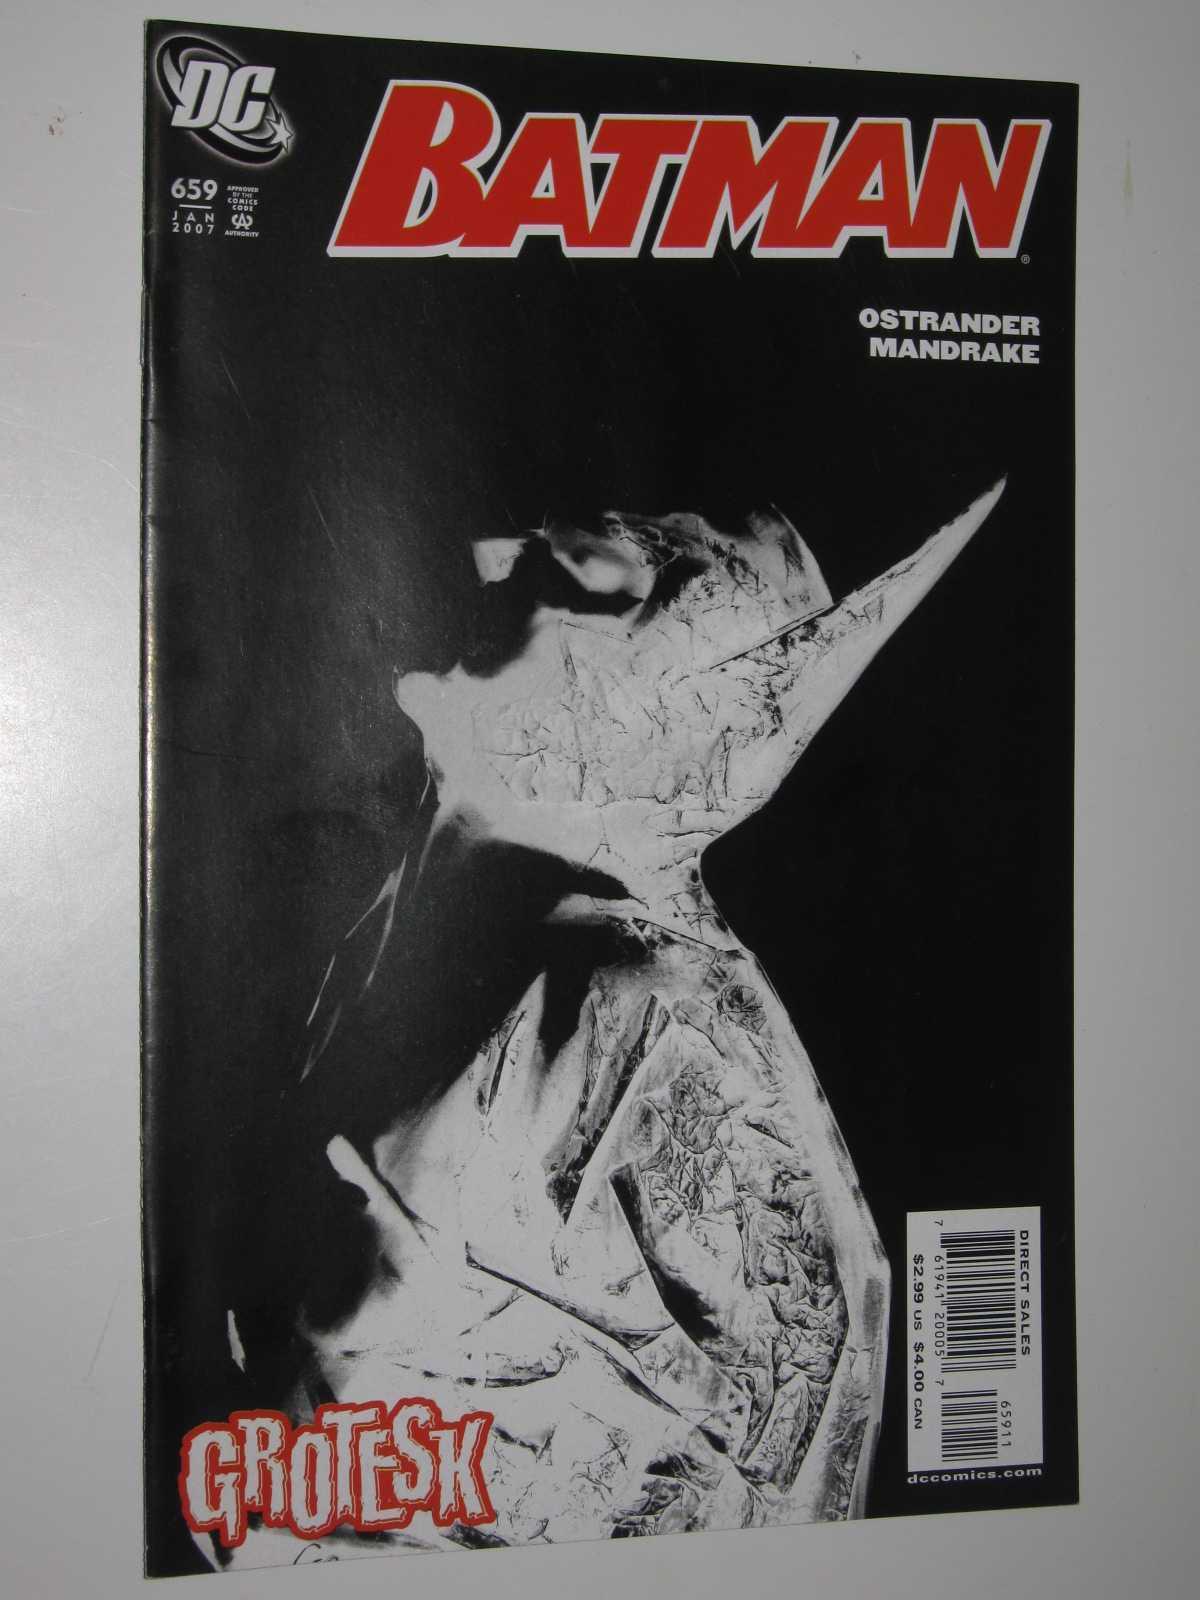 Batman #659 : January 2007, Ostrander + Mandrake